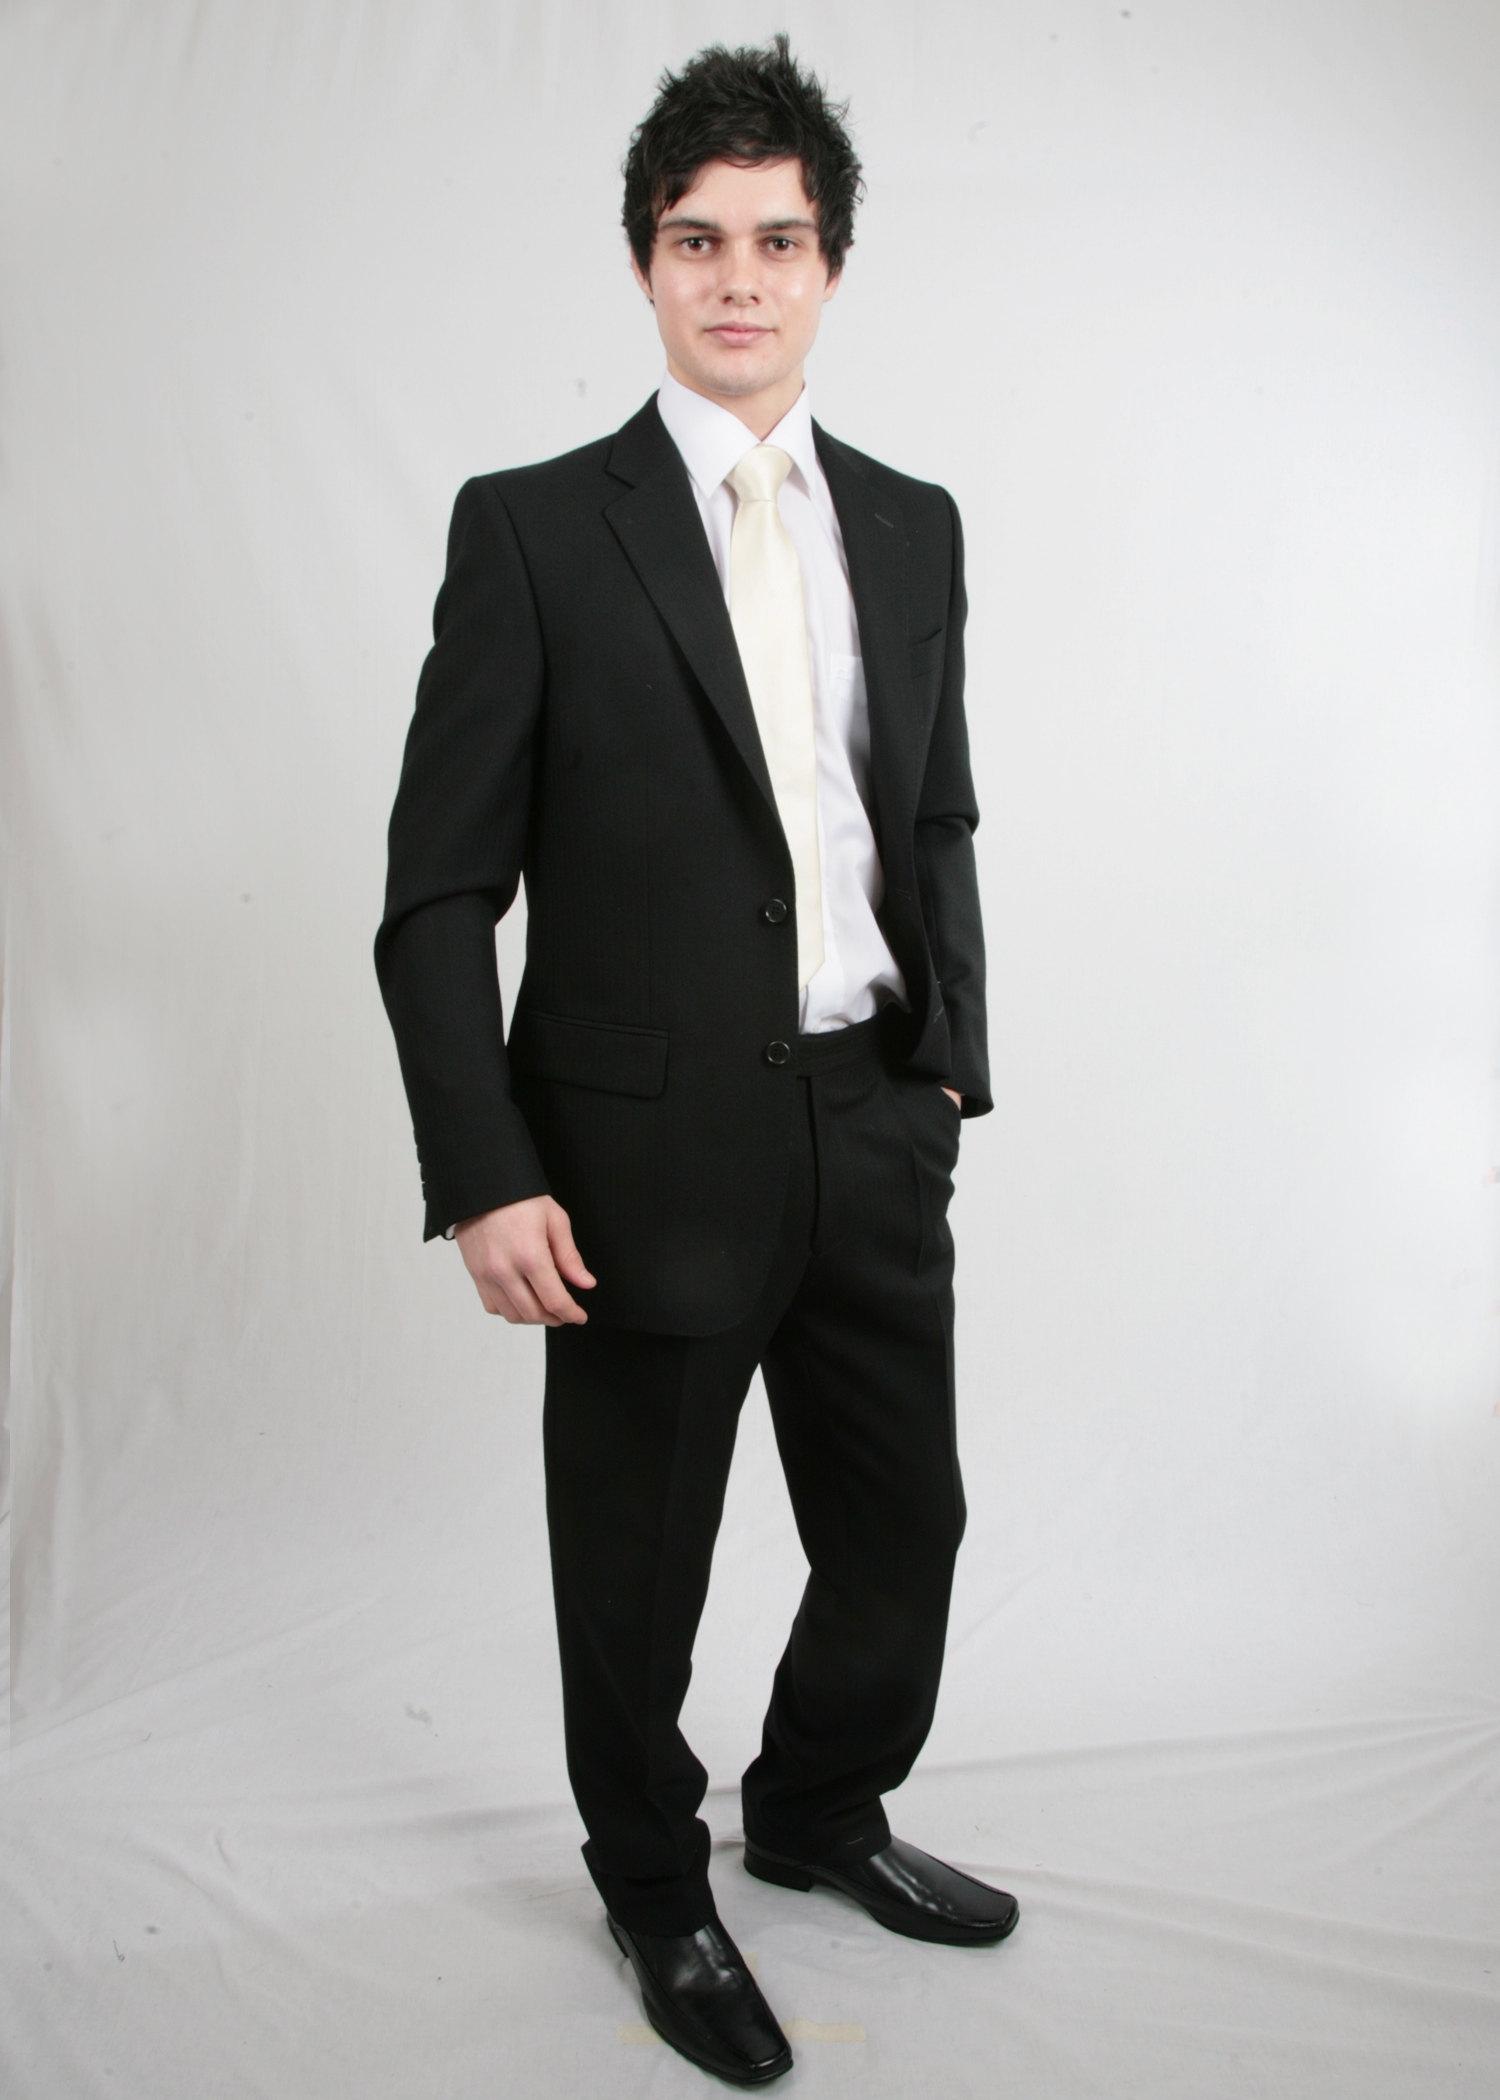 Short Black Morning Suit Hire